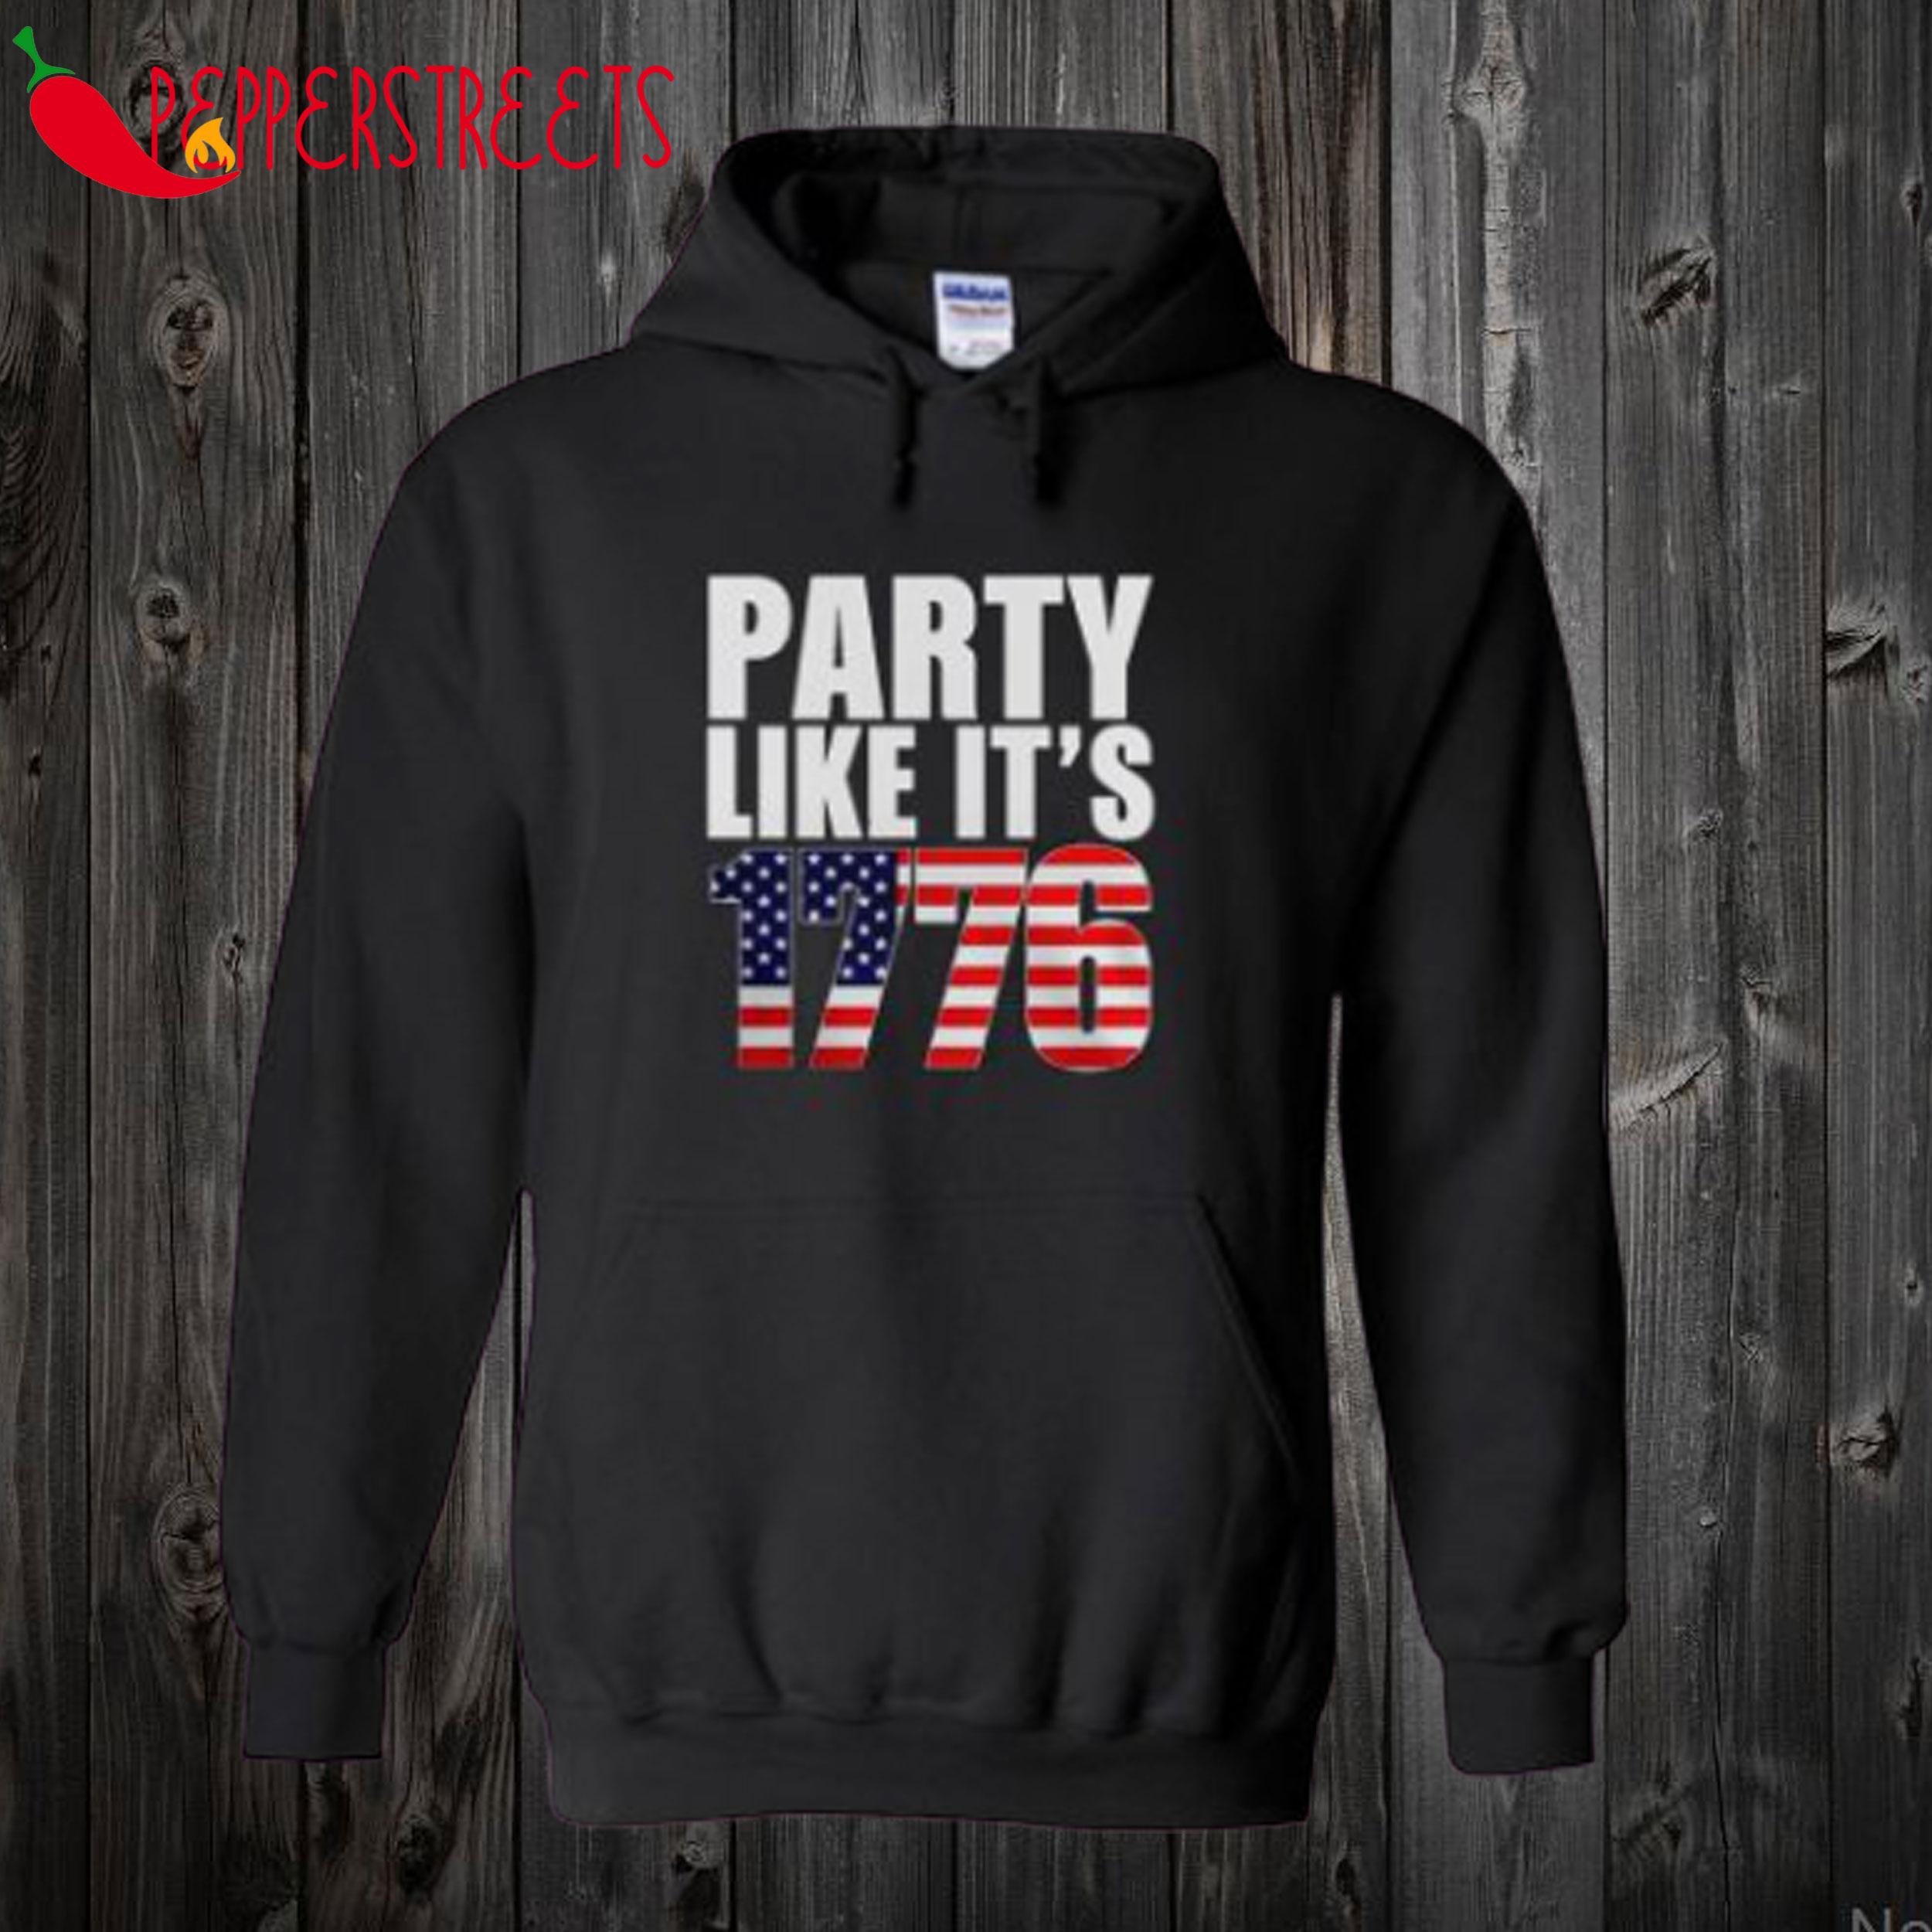 Party like its 1776 black Hoodie